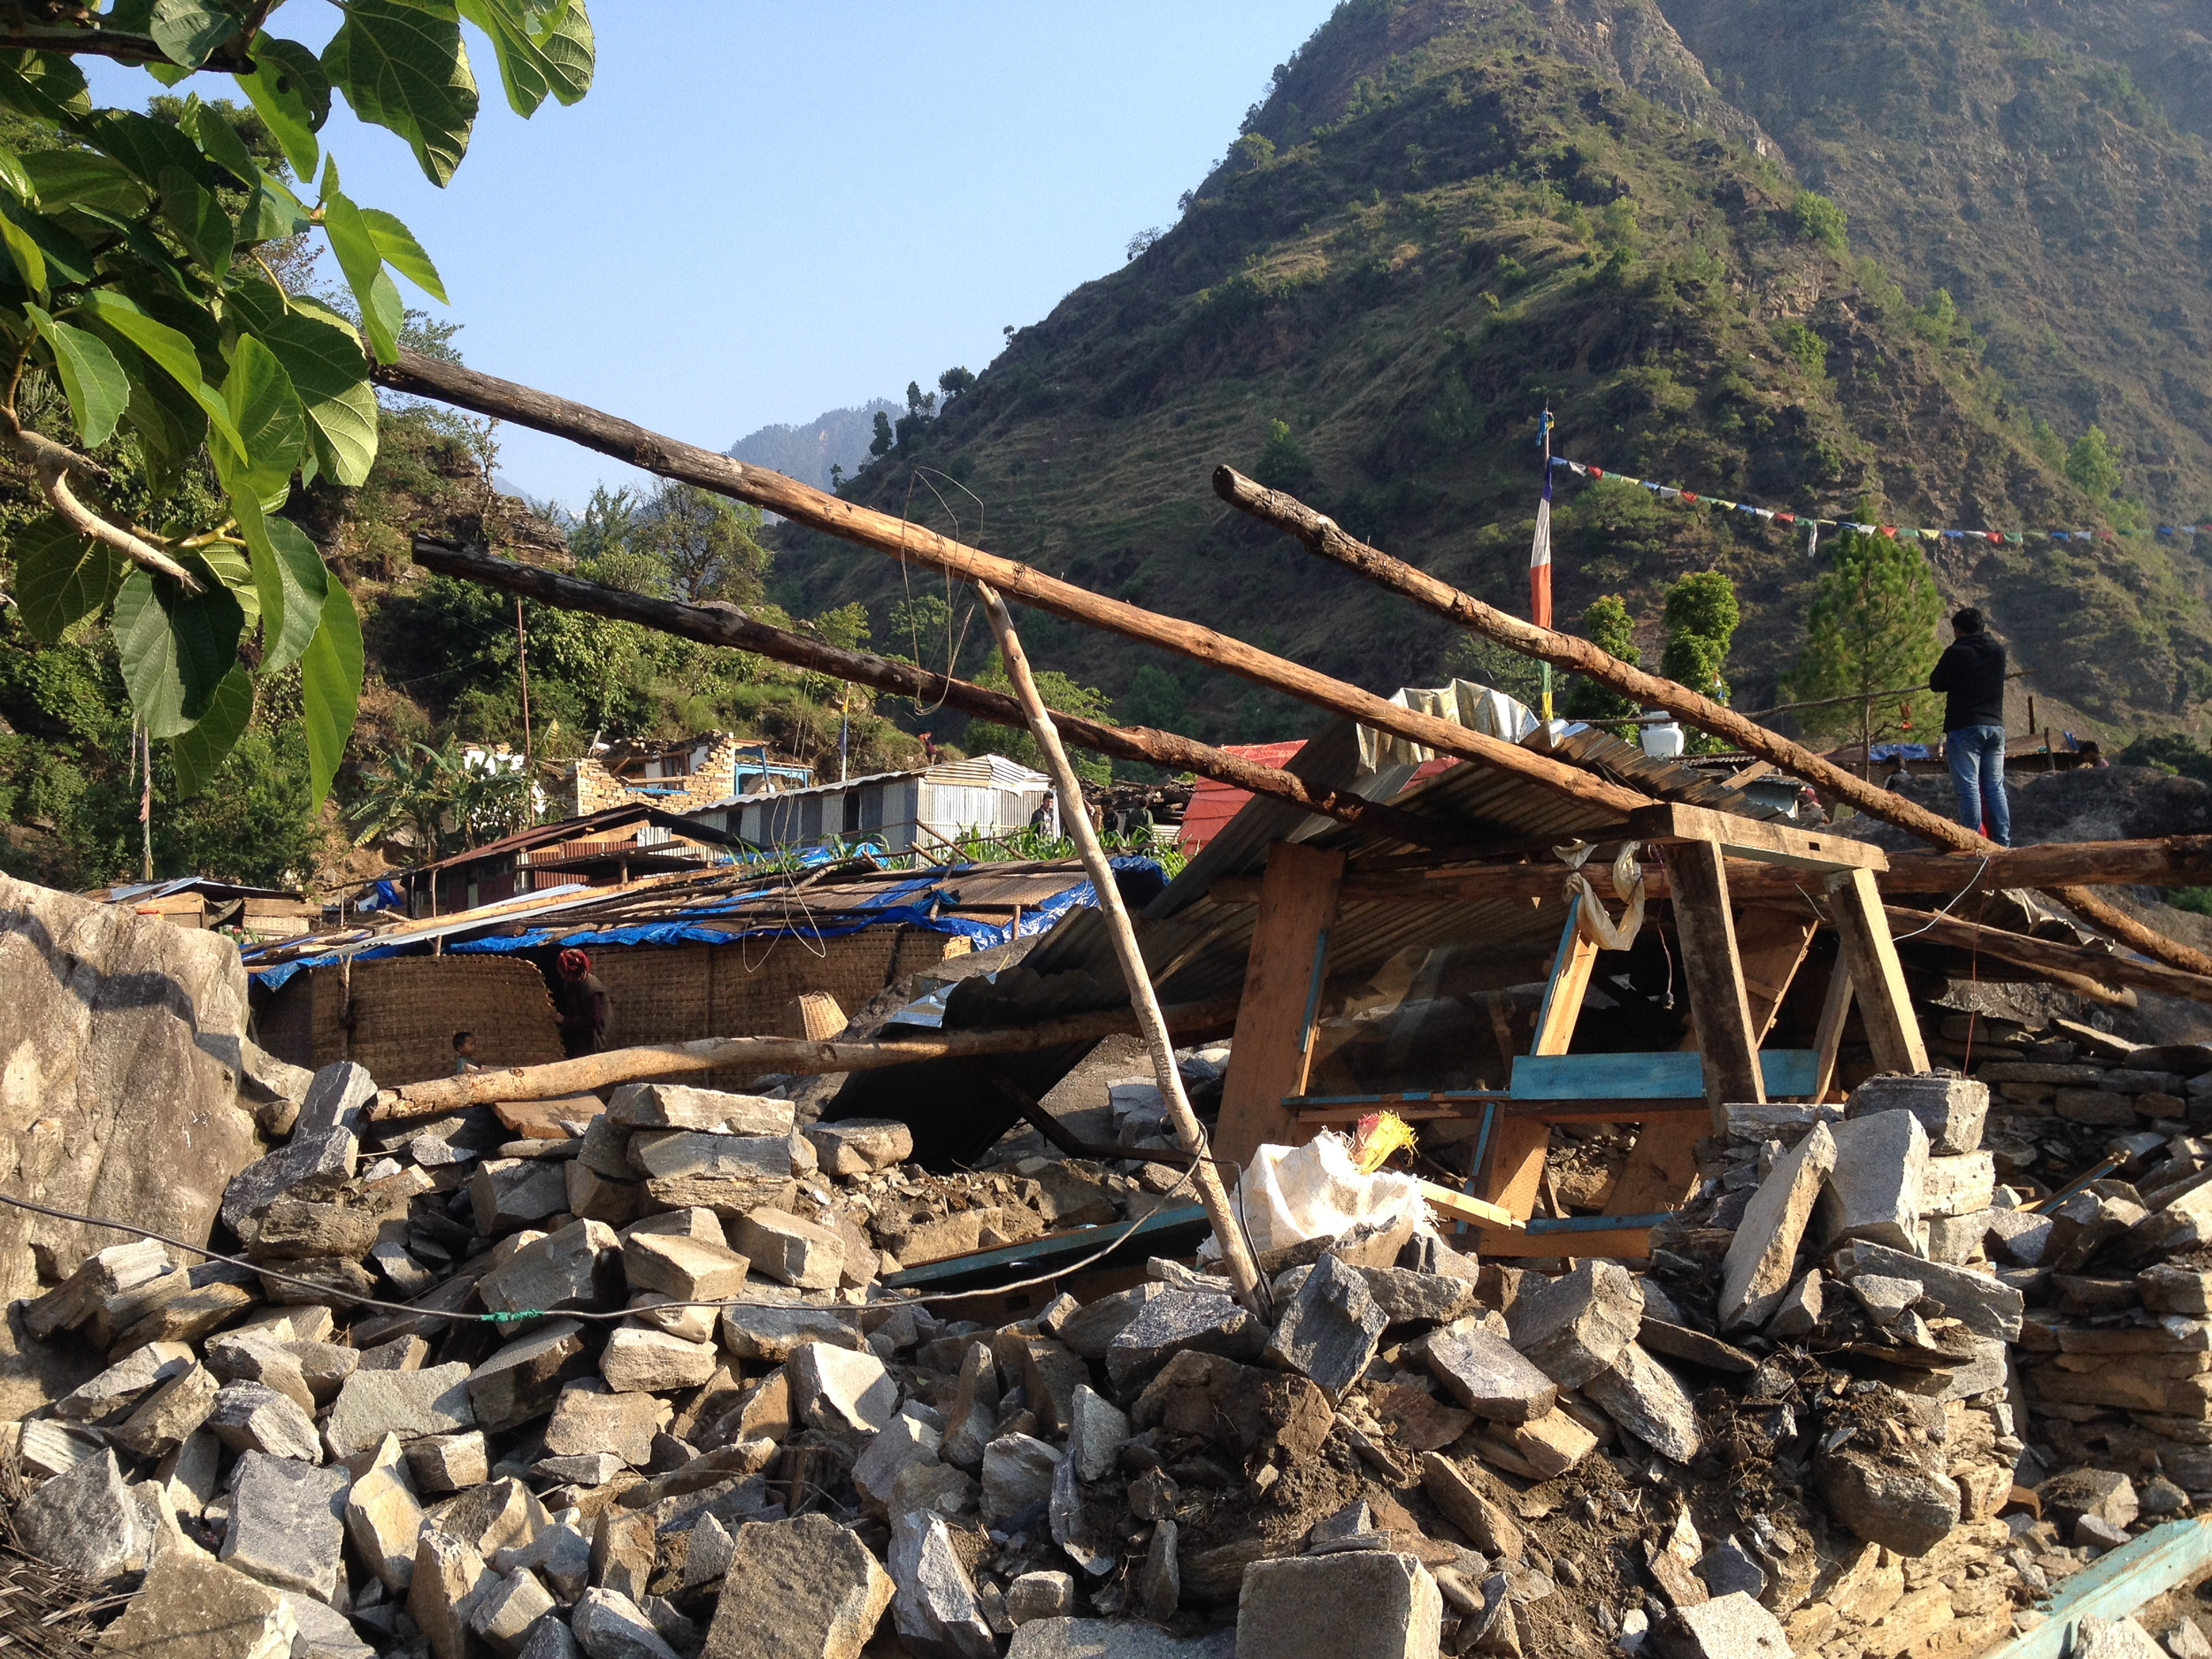 nepal_daniels-fotos_IMG_5423.jpg